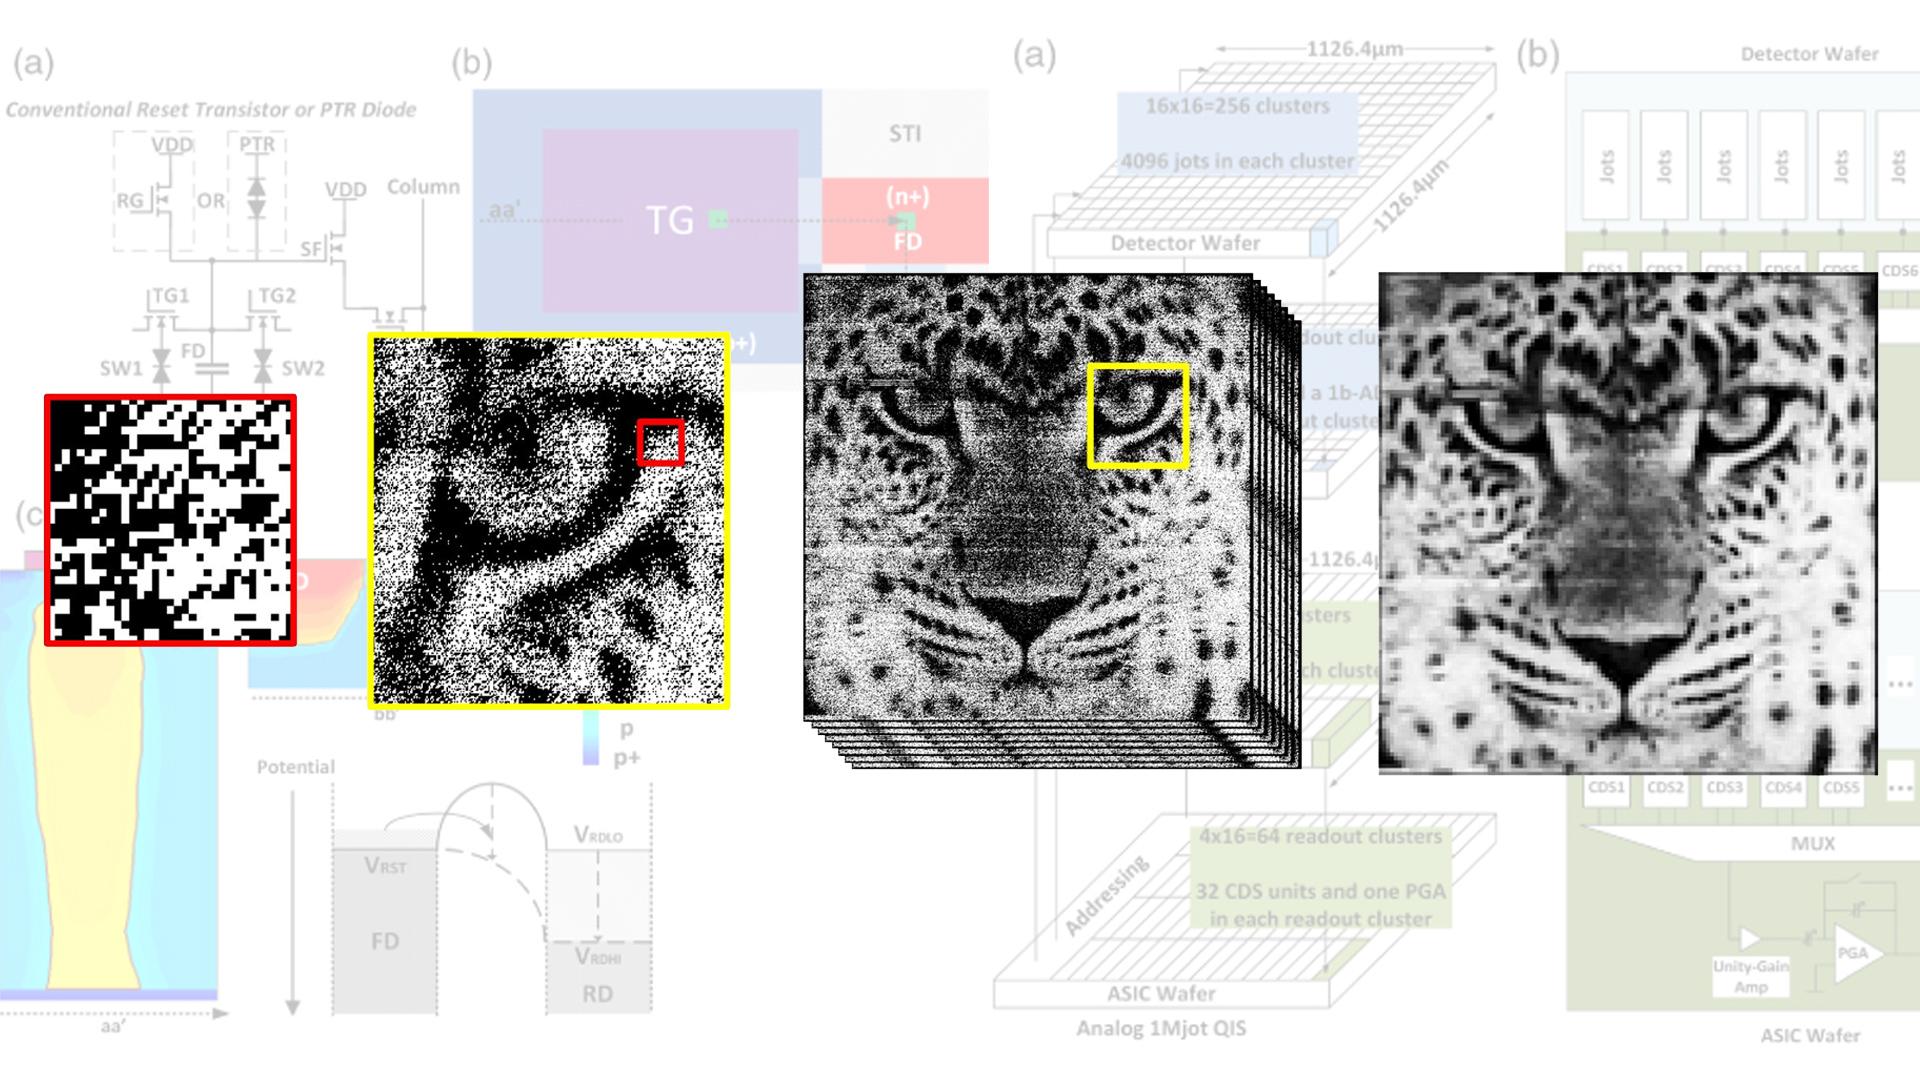 Quantaイメージセンサーが超低照度特性を実現